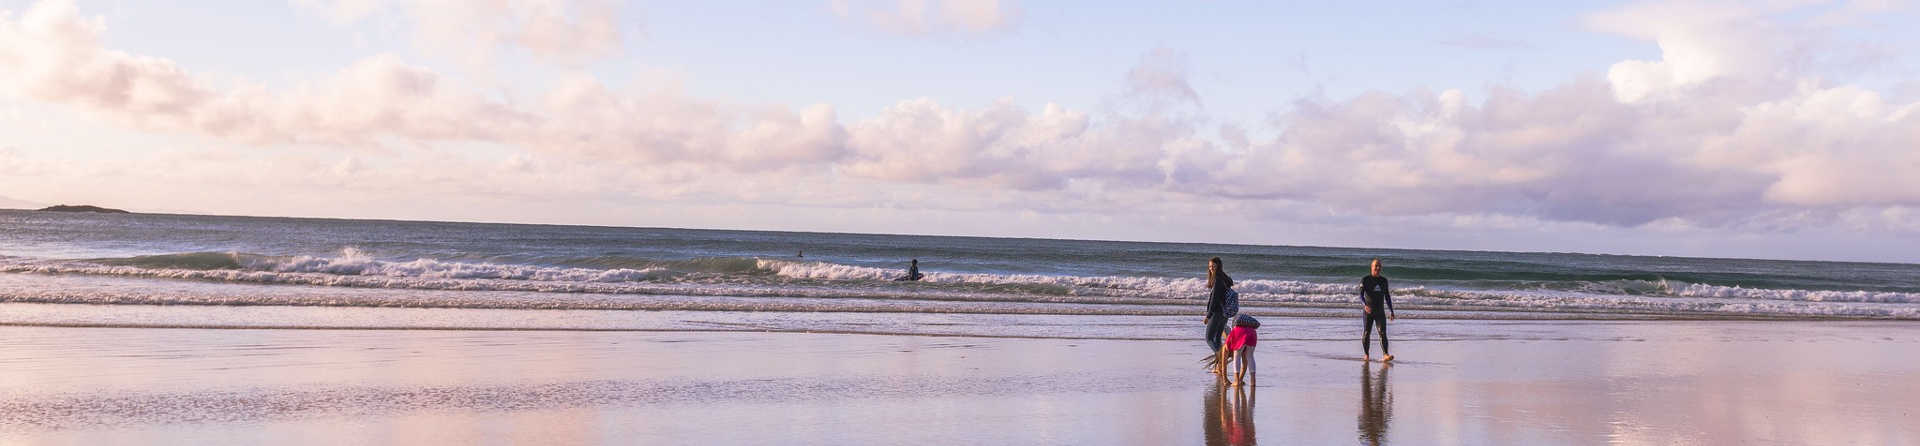 Is it safe to swim at Stradbroke Island?